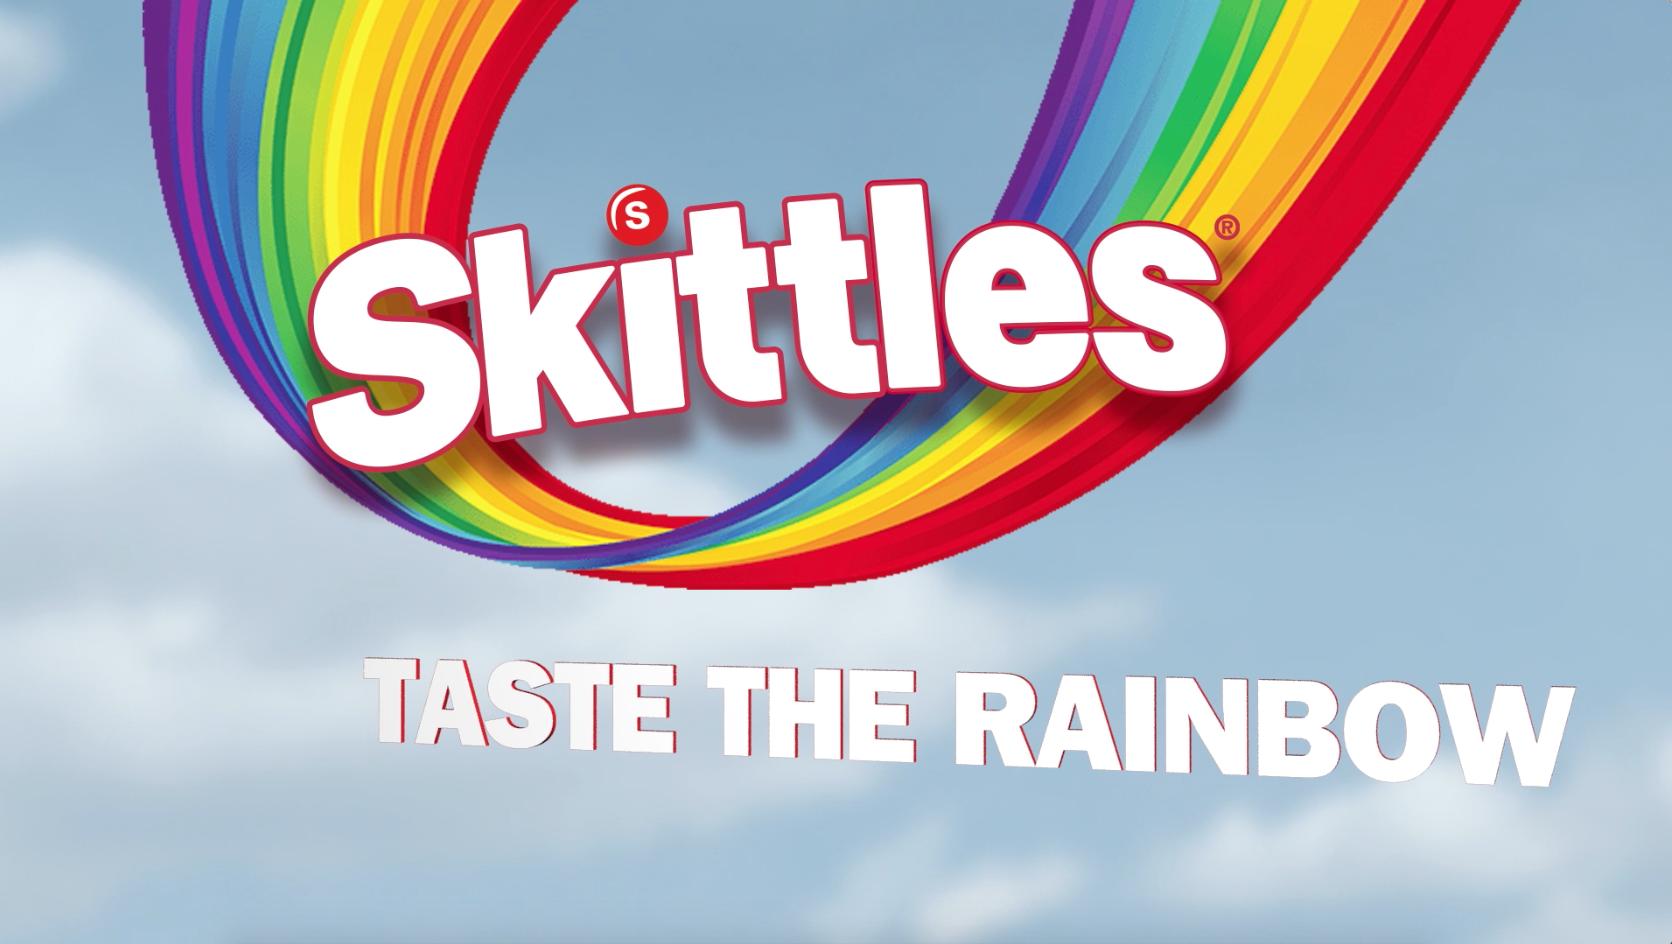 Skittles Brings the Rainbow to BAM! - BAM Studios Skittles Taste The Rainbow Logo